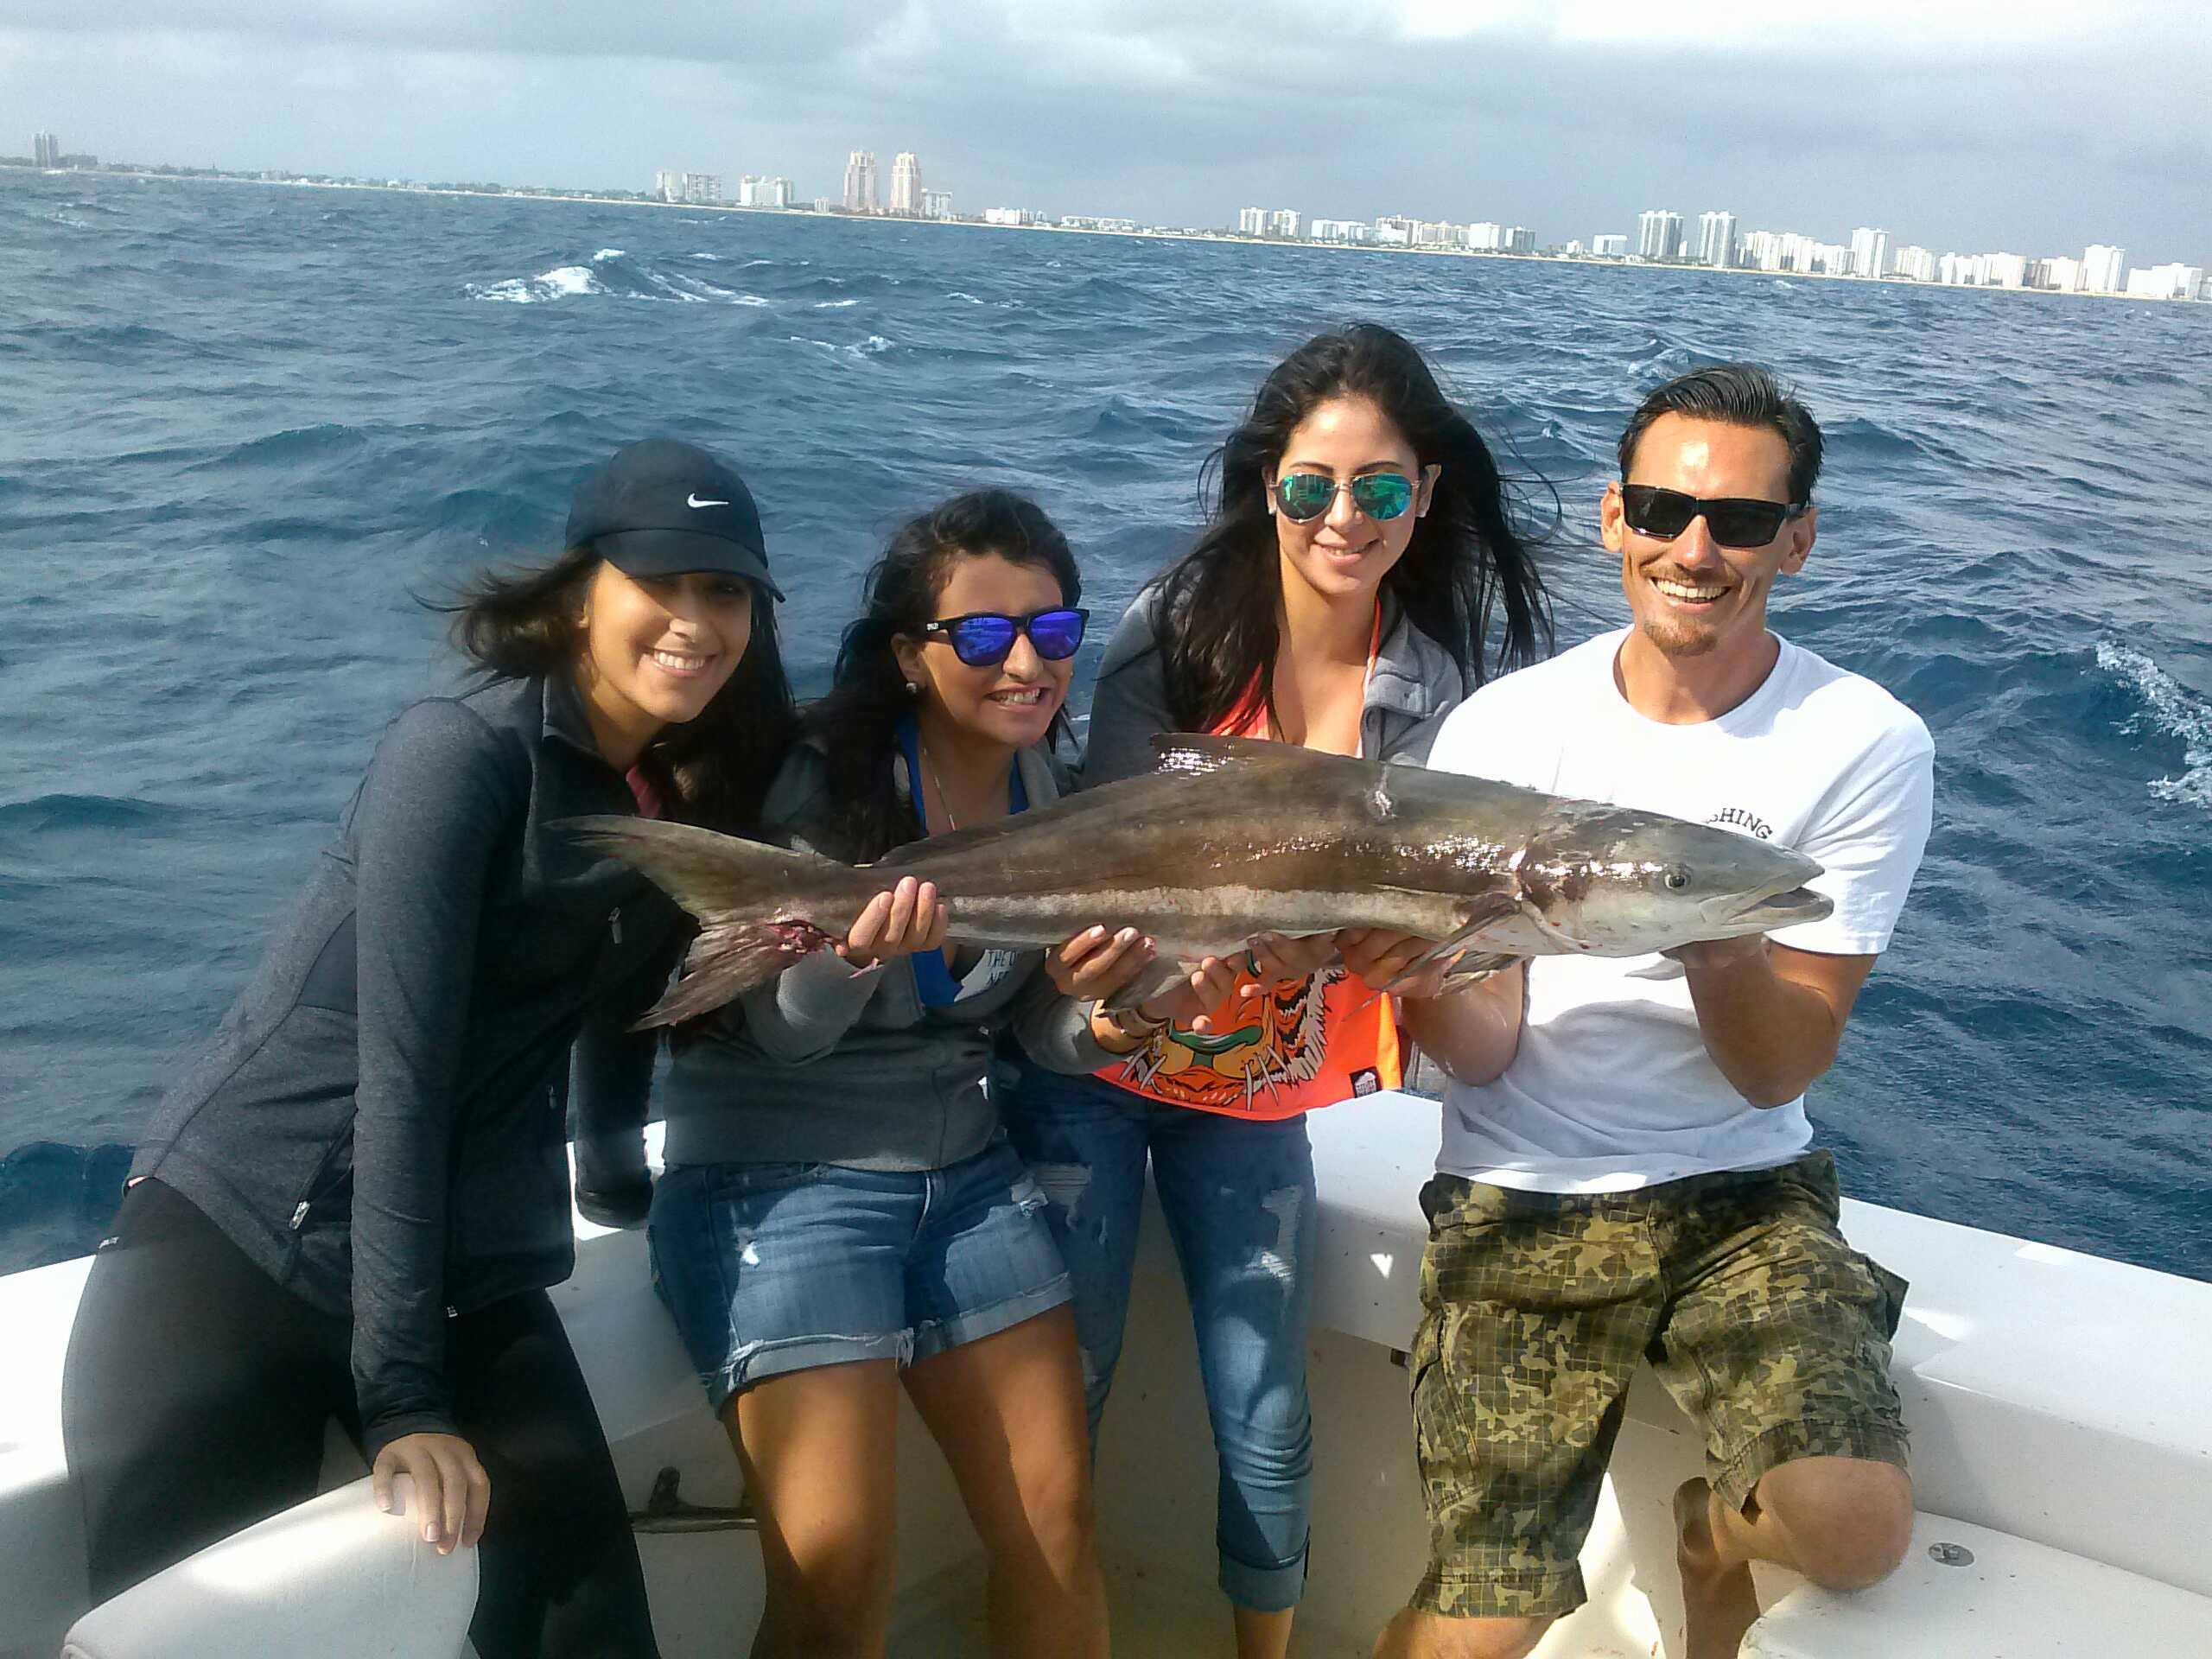 Good Sportfishing Trips This Week In Fort Lauderdale